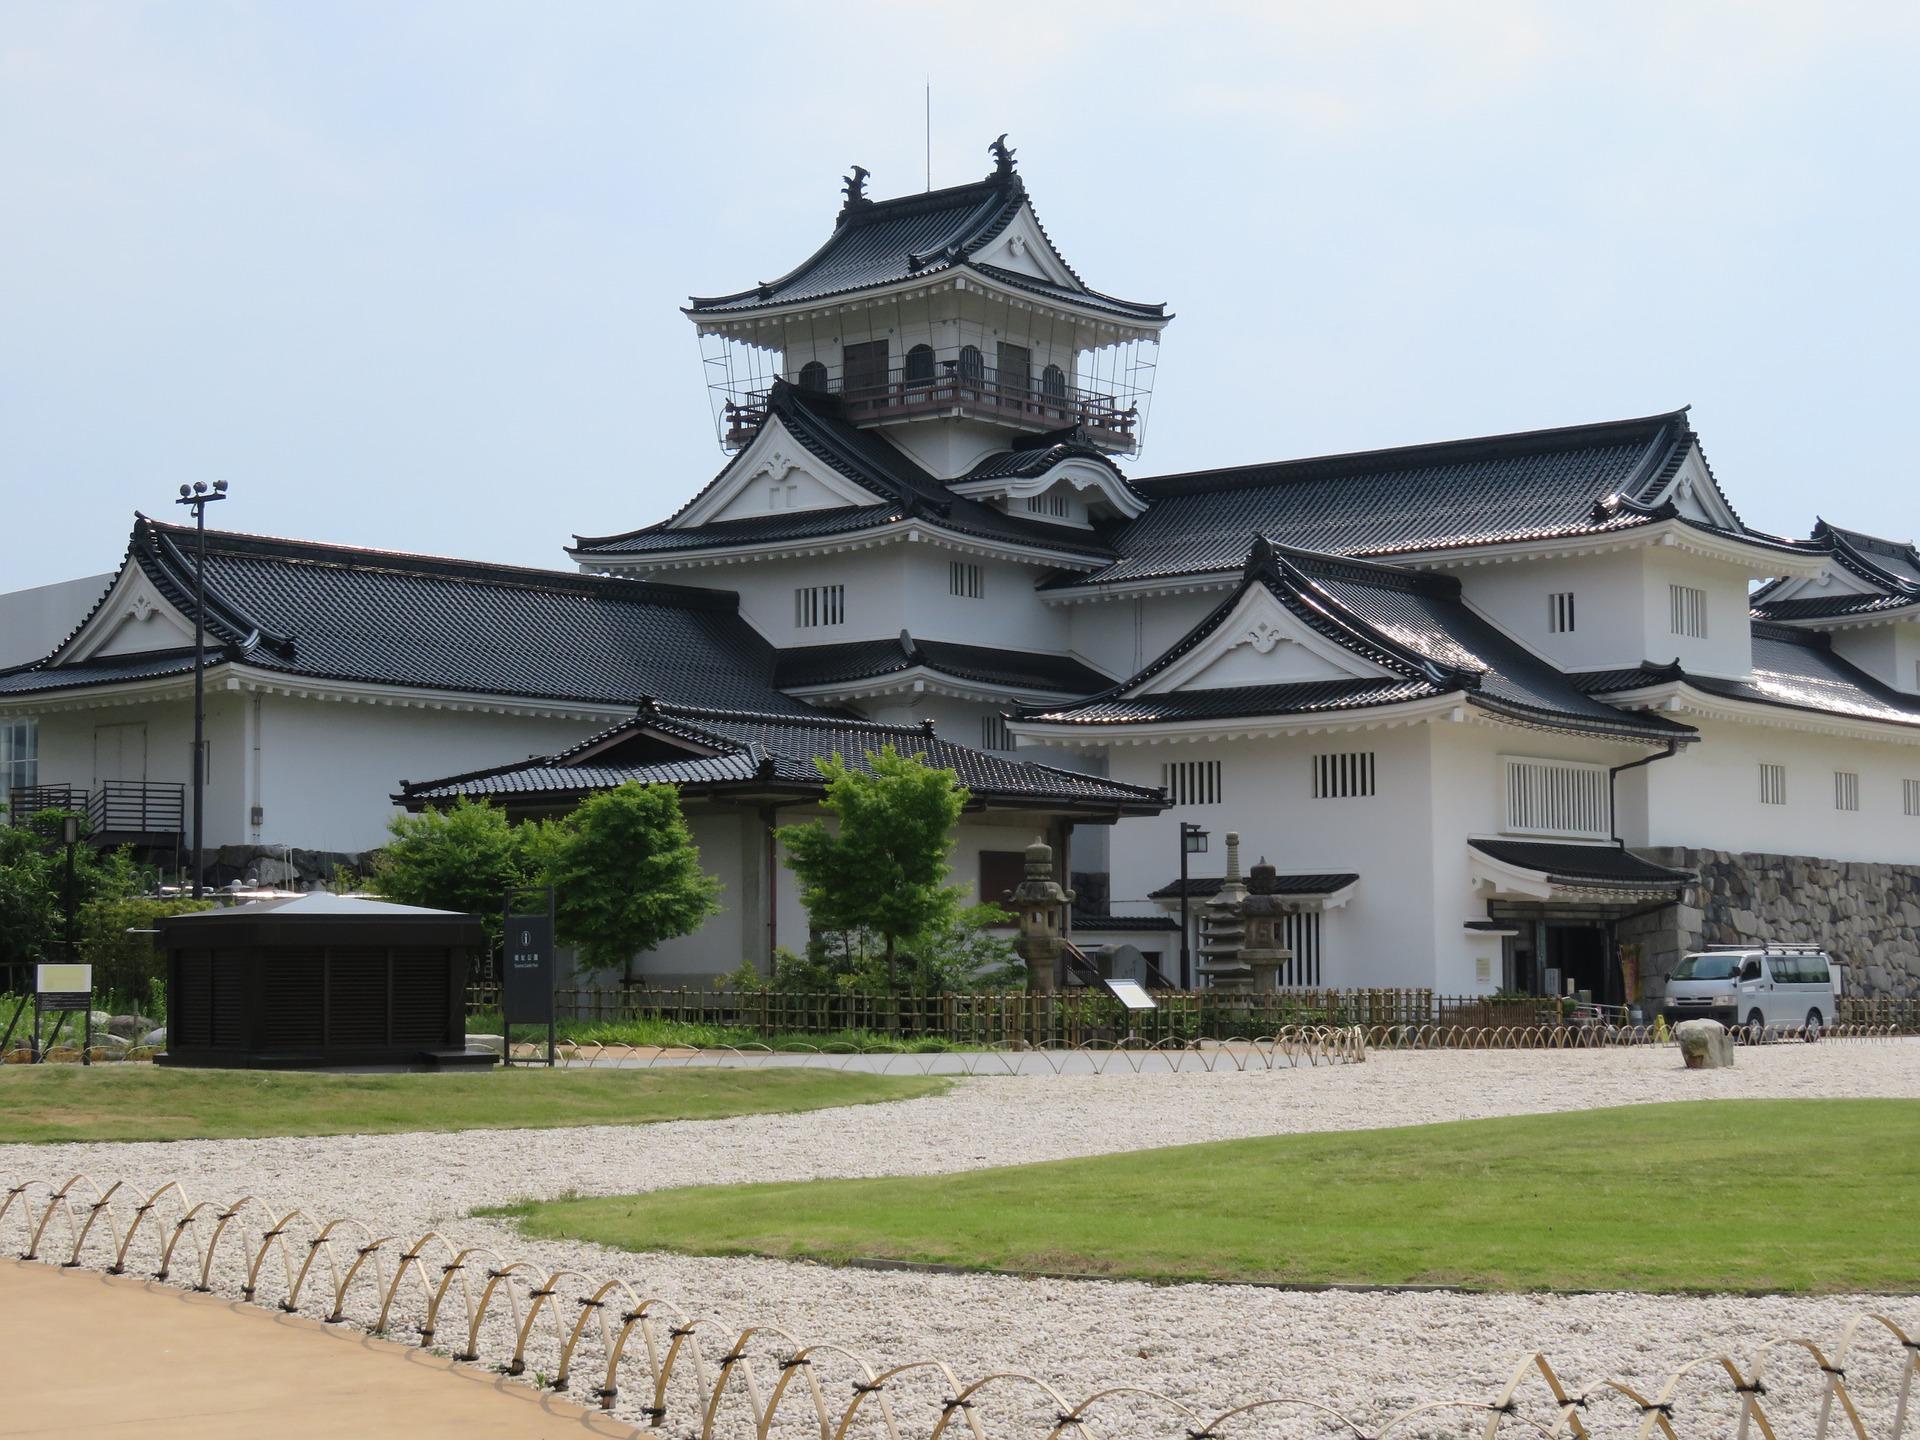 Hokuriku Golden Arch | Toyama Castle, Japan